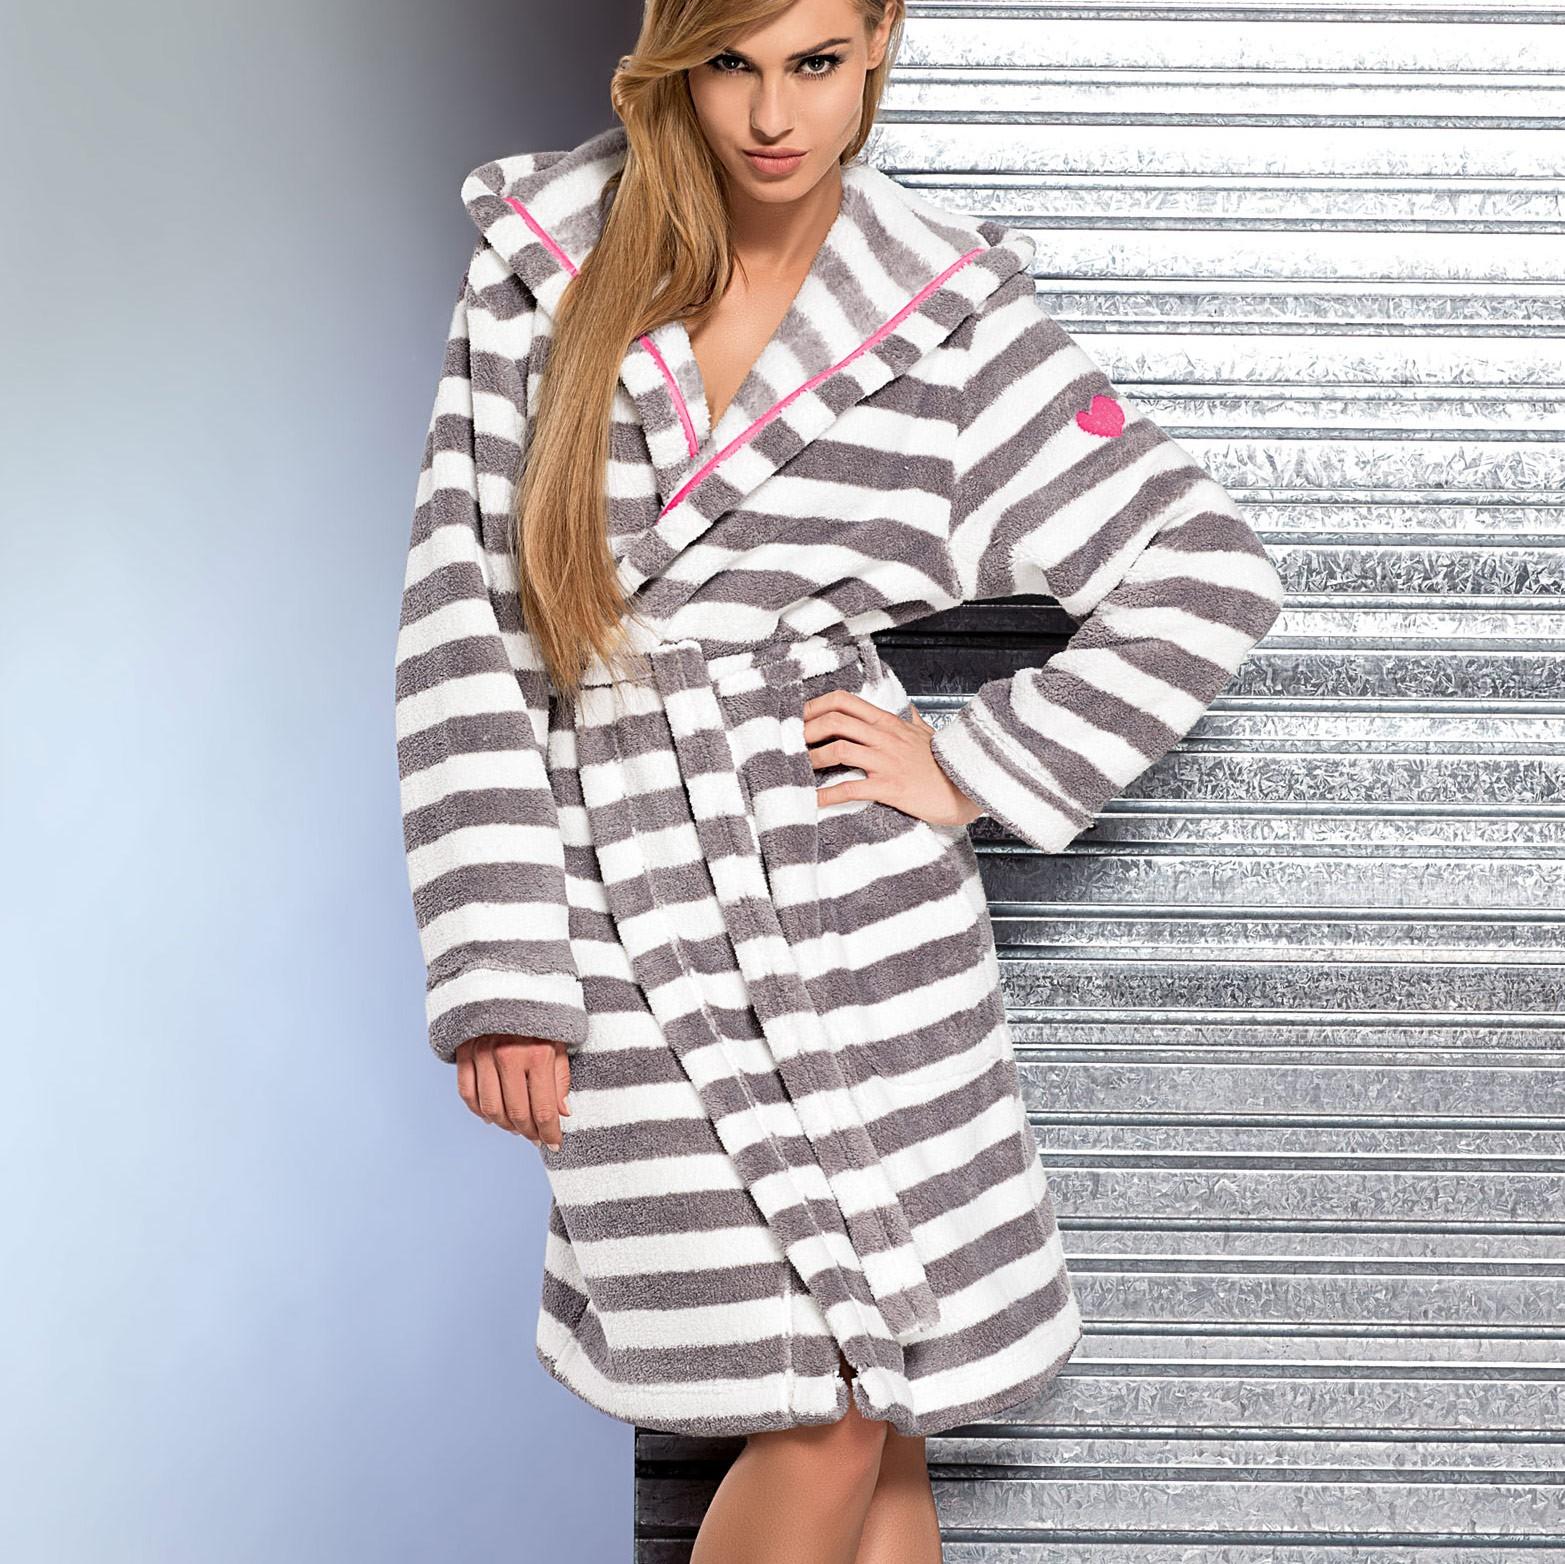 Robe De Chambre Ado Idée Pour S Habiller